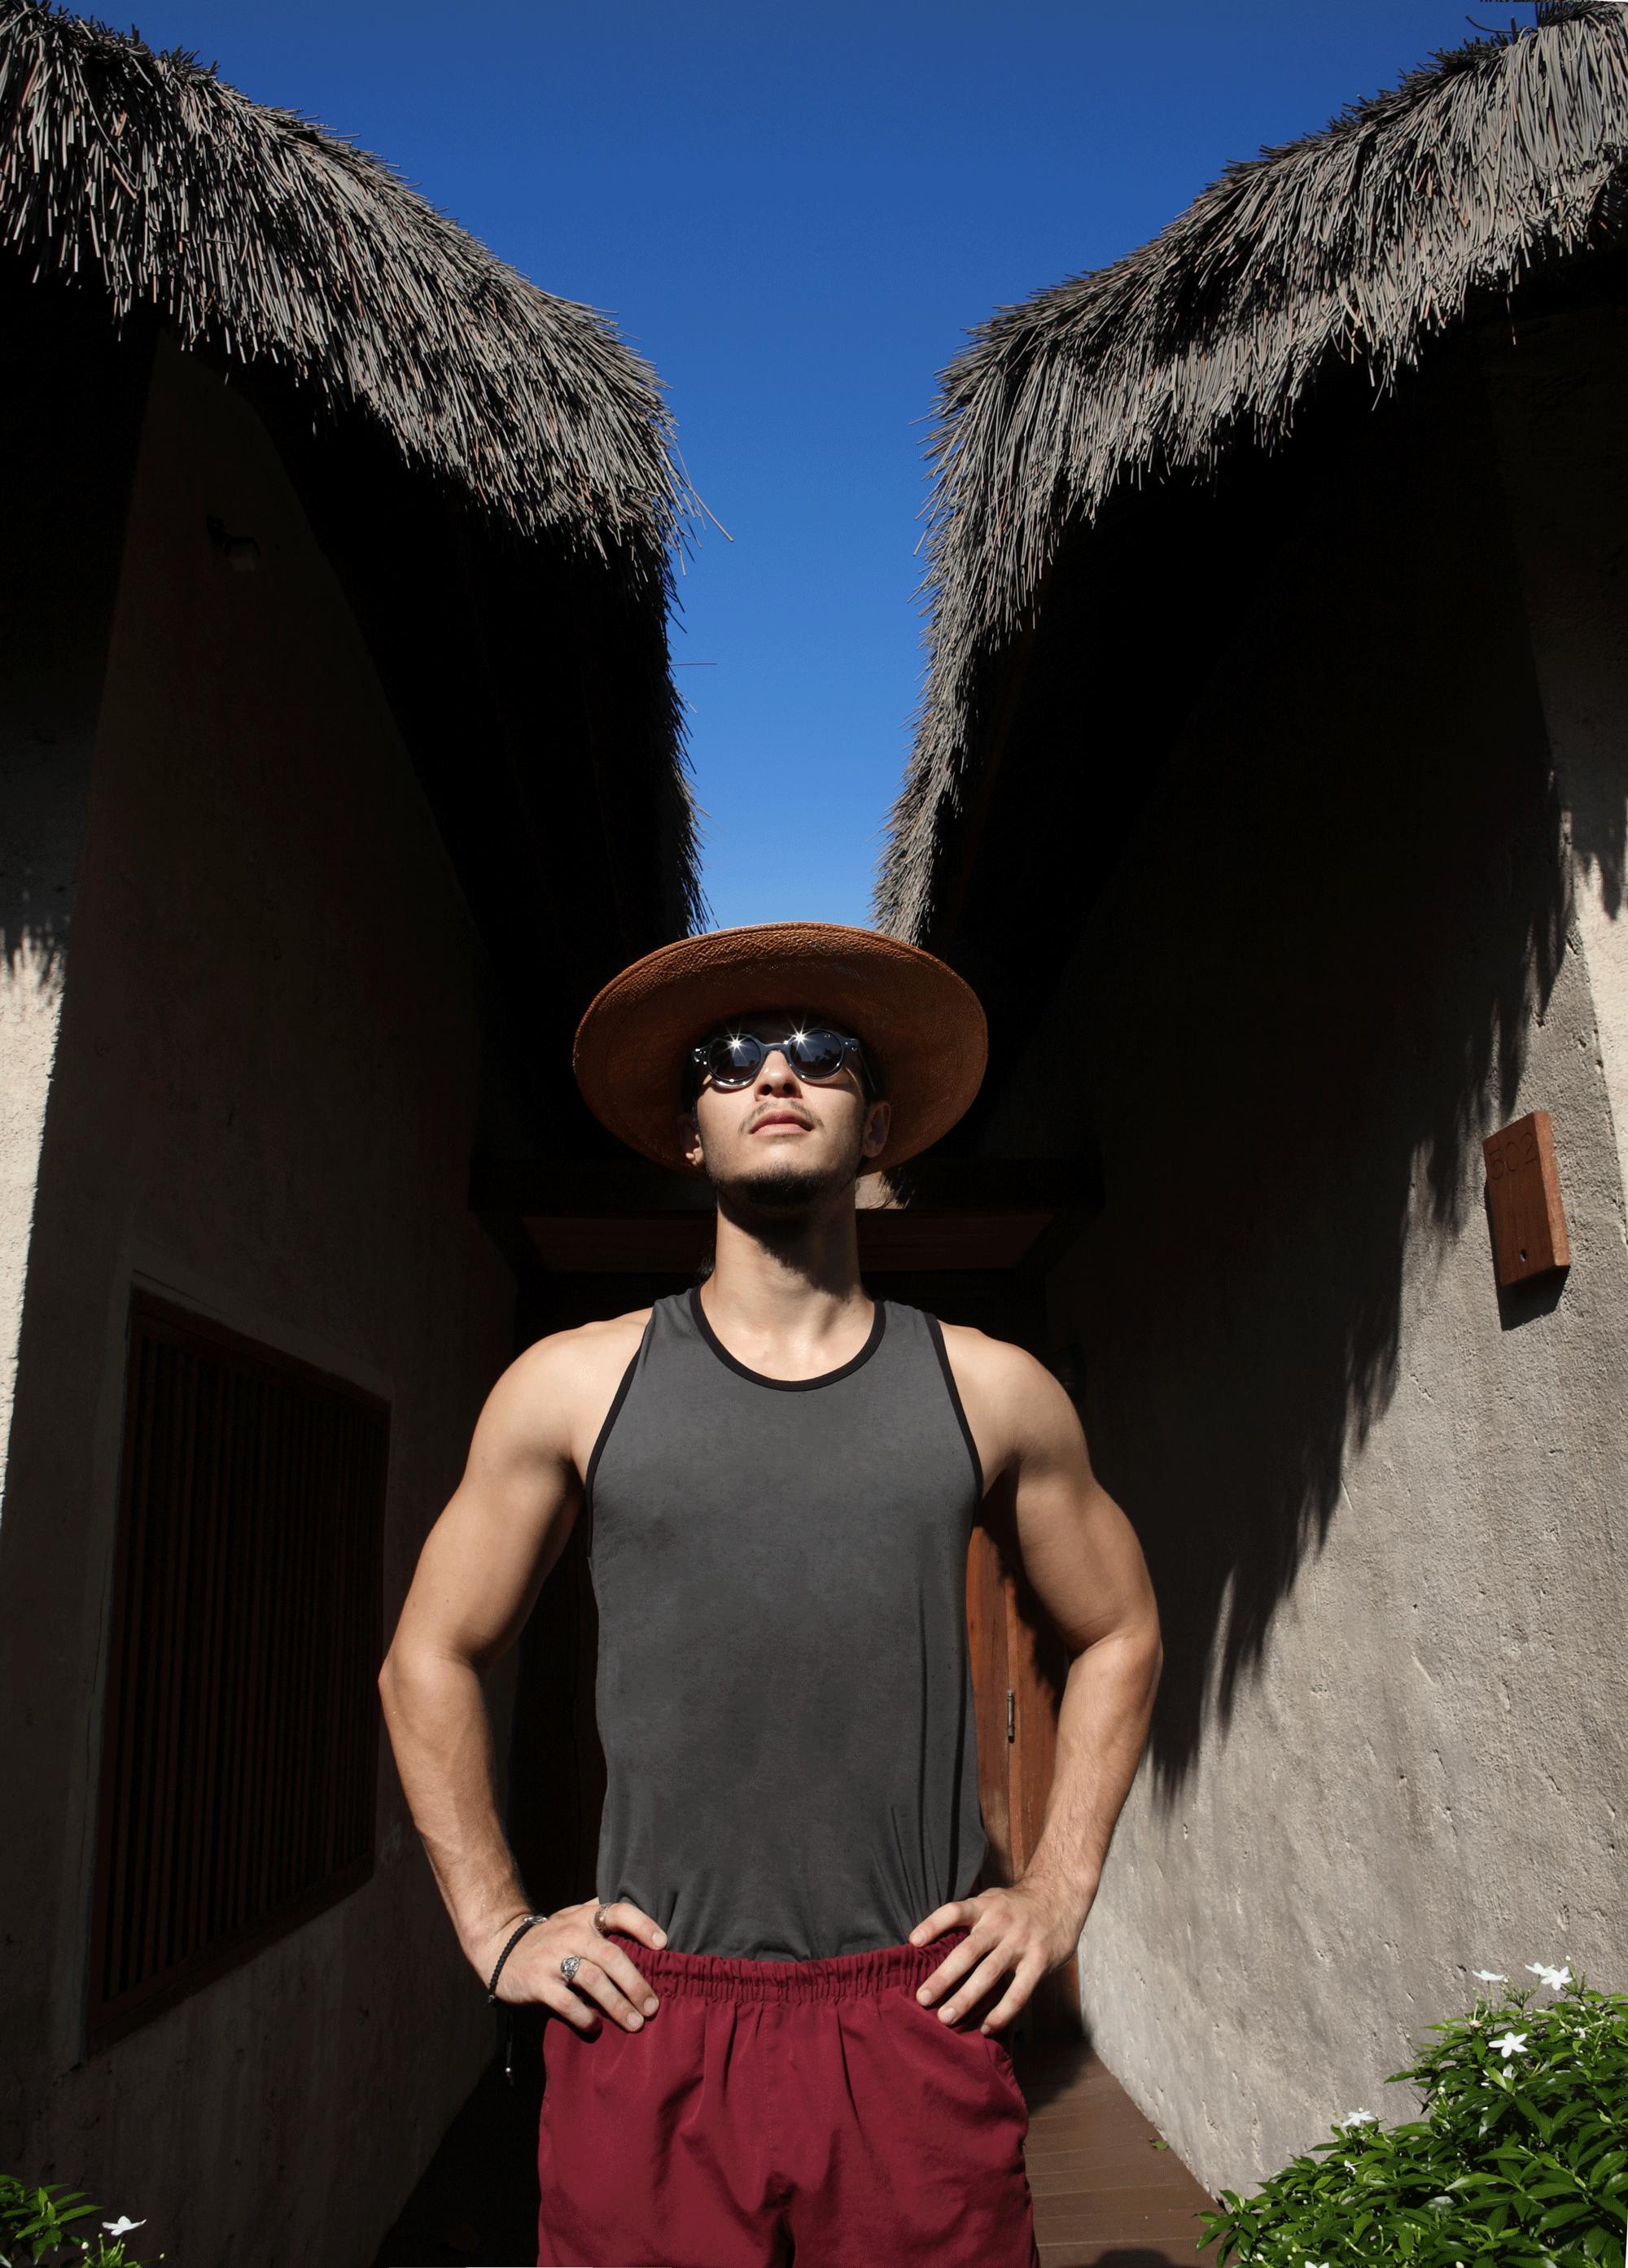 tanktop : NOXX wear / hat : Famosa Andina / sunglasses : Blake Kuwahara